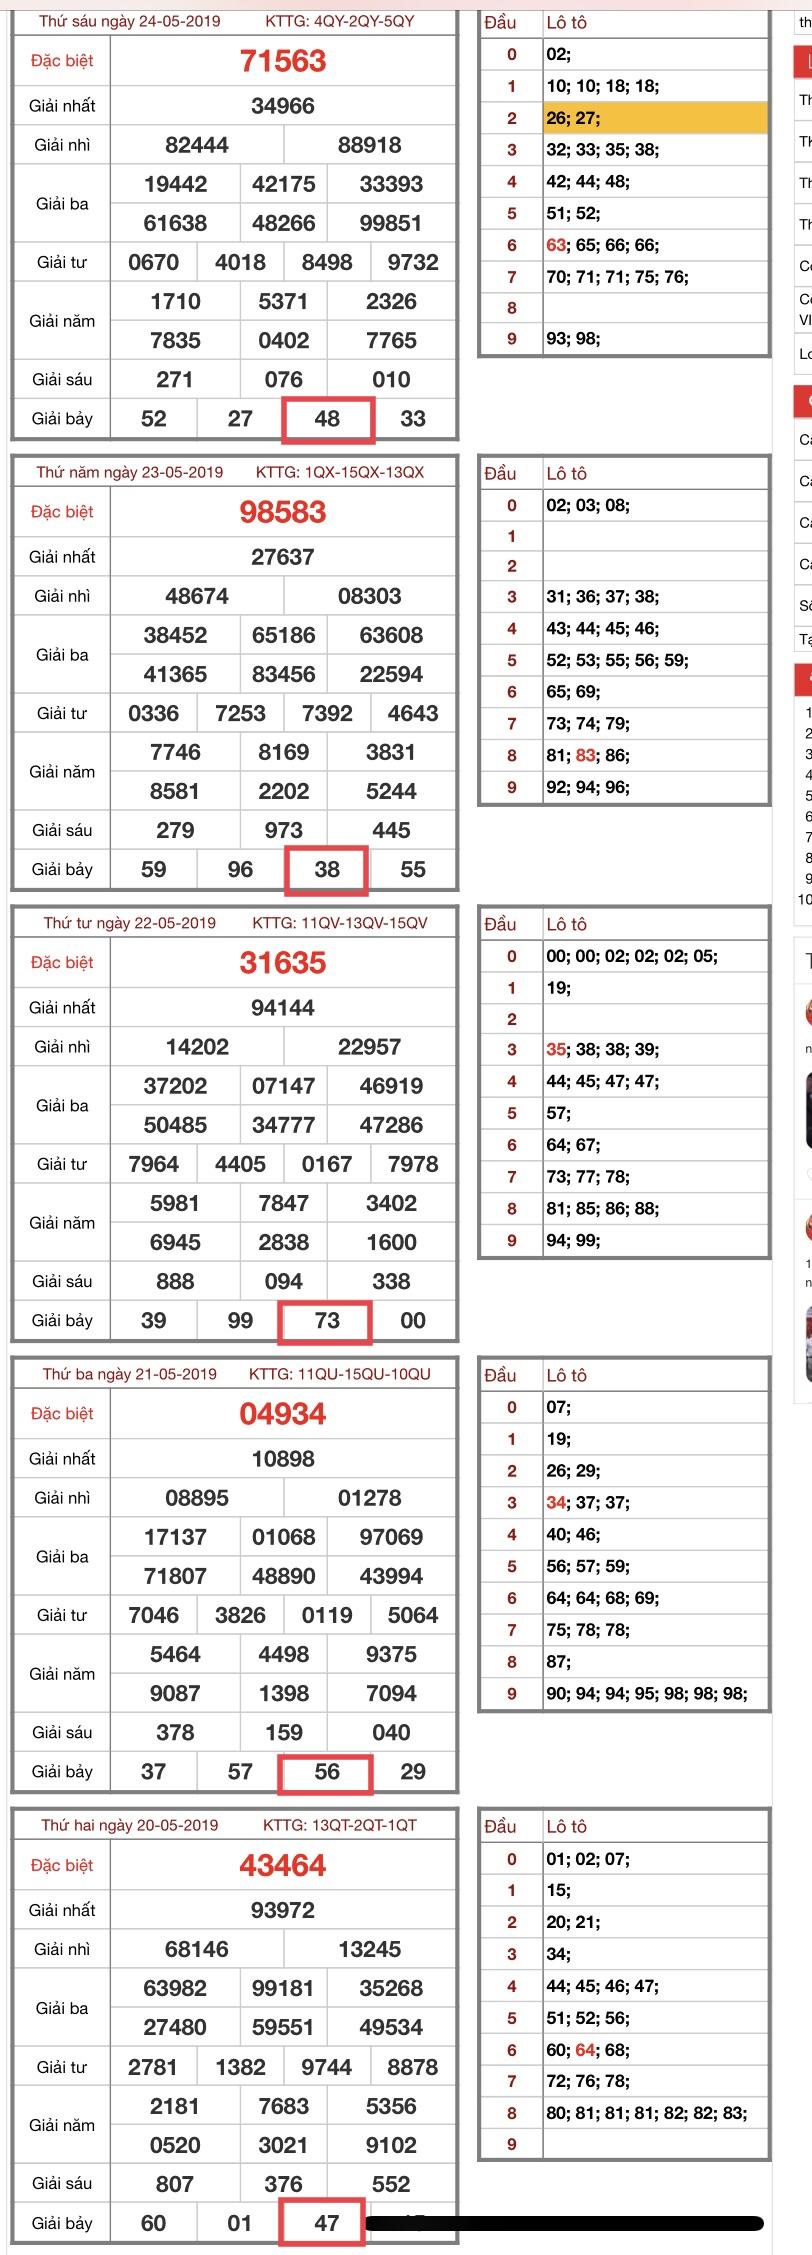 EAF318A0-75D9-4D90-89D4-CABB687D457D.jpeg